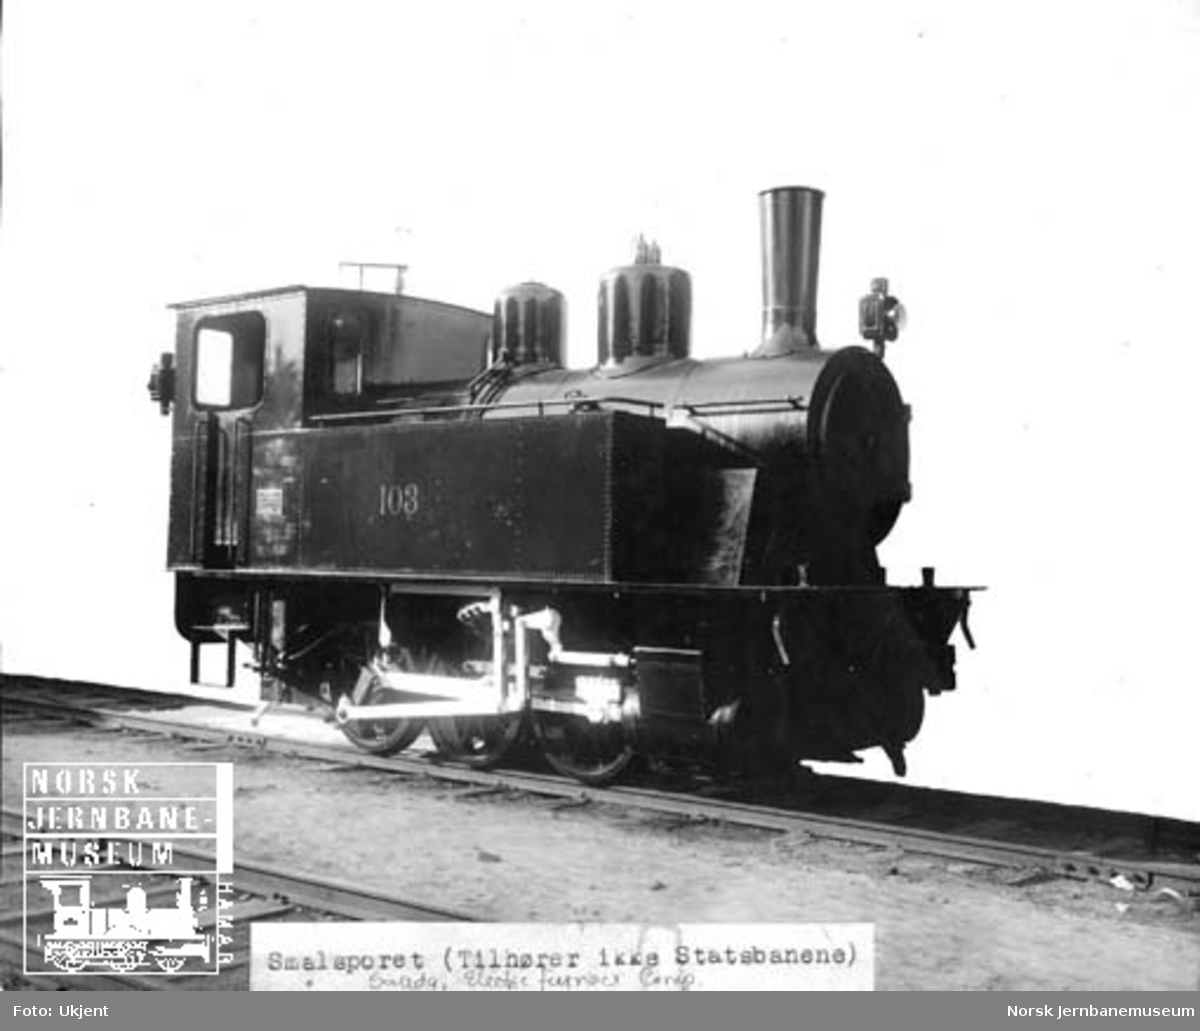 Leveransefoto av Electric Furnace Products Companys damplokomotiv nr. 103